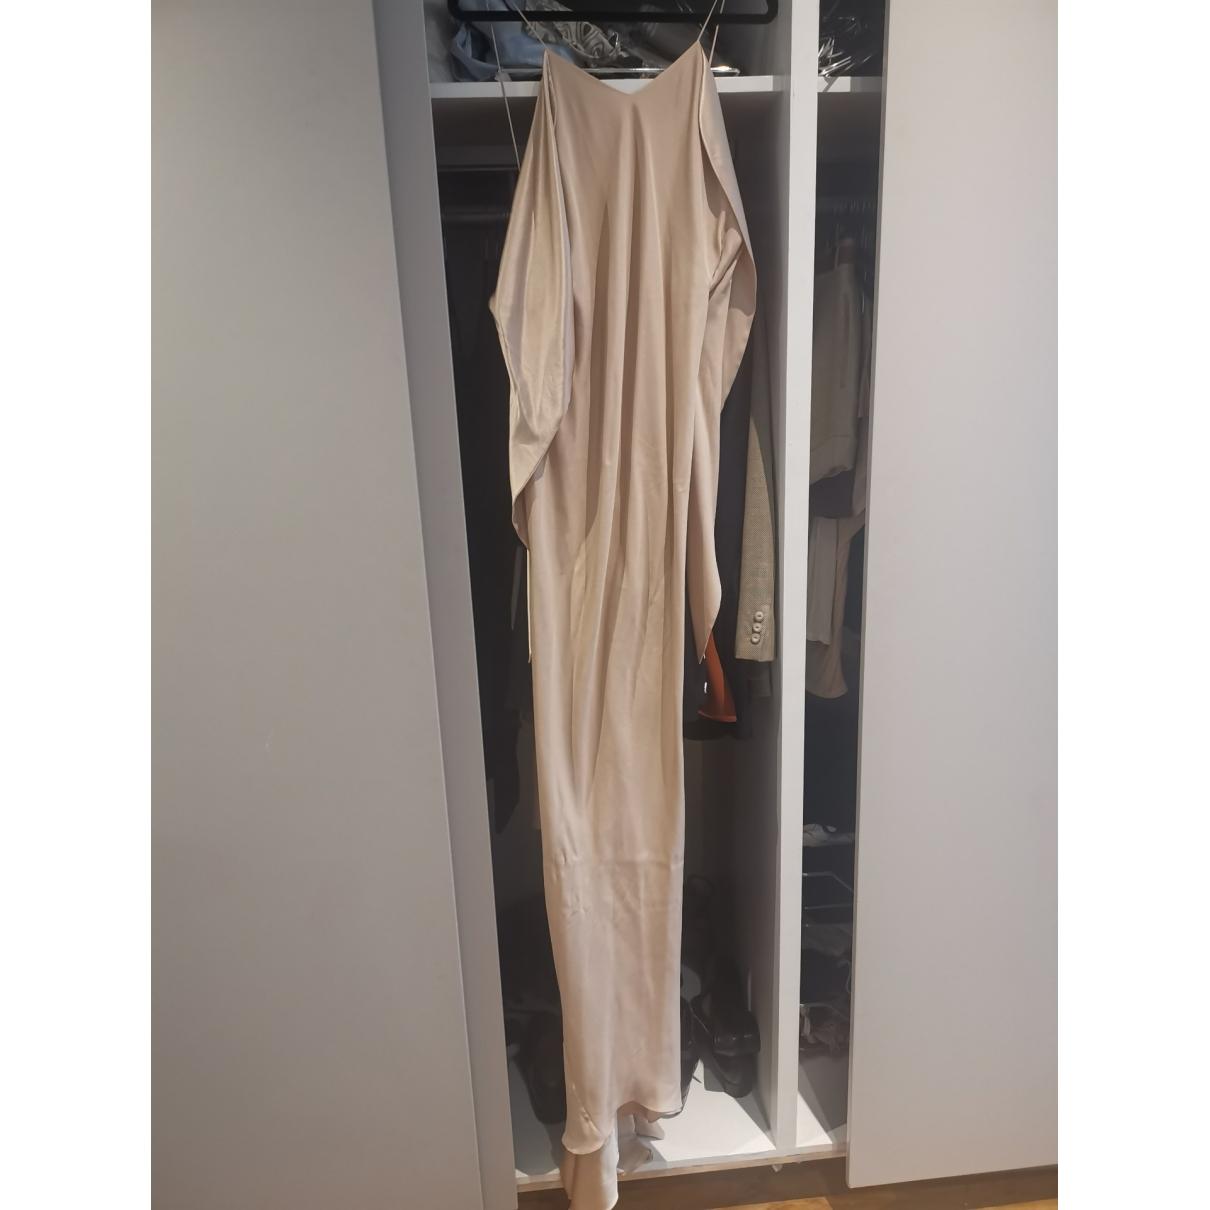 Ermanno Scervino \N Beige Silk dress for Women 36 FR